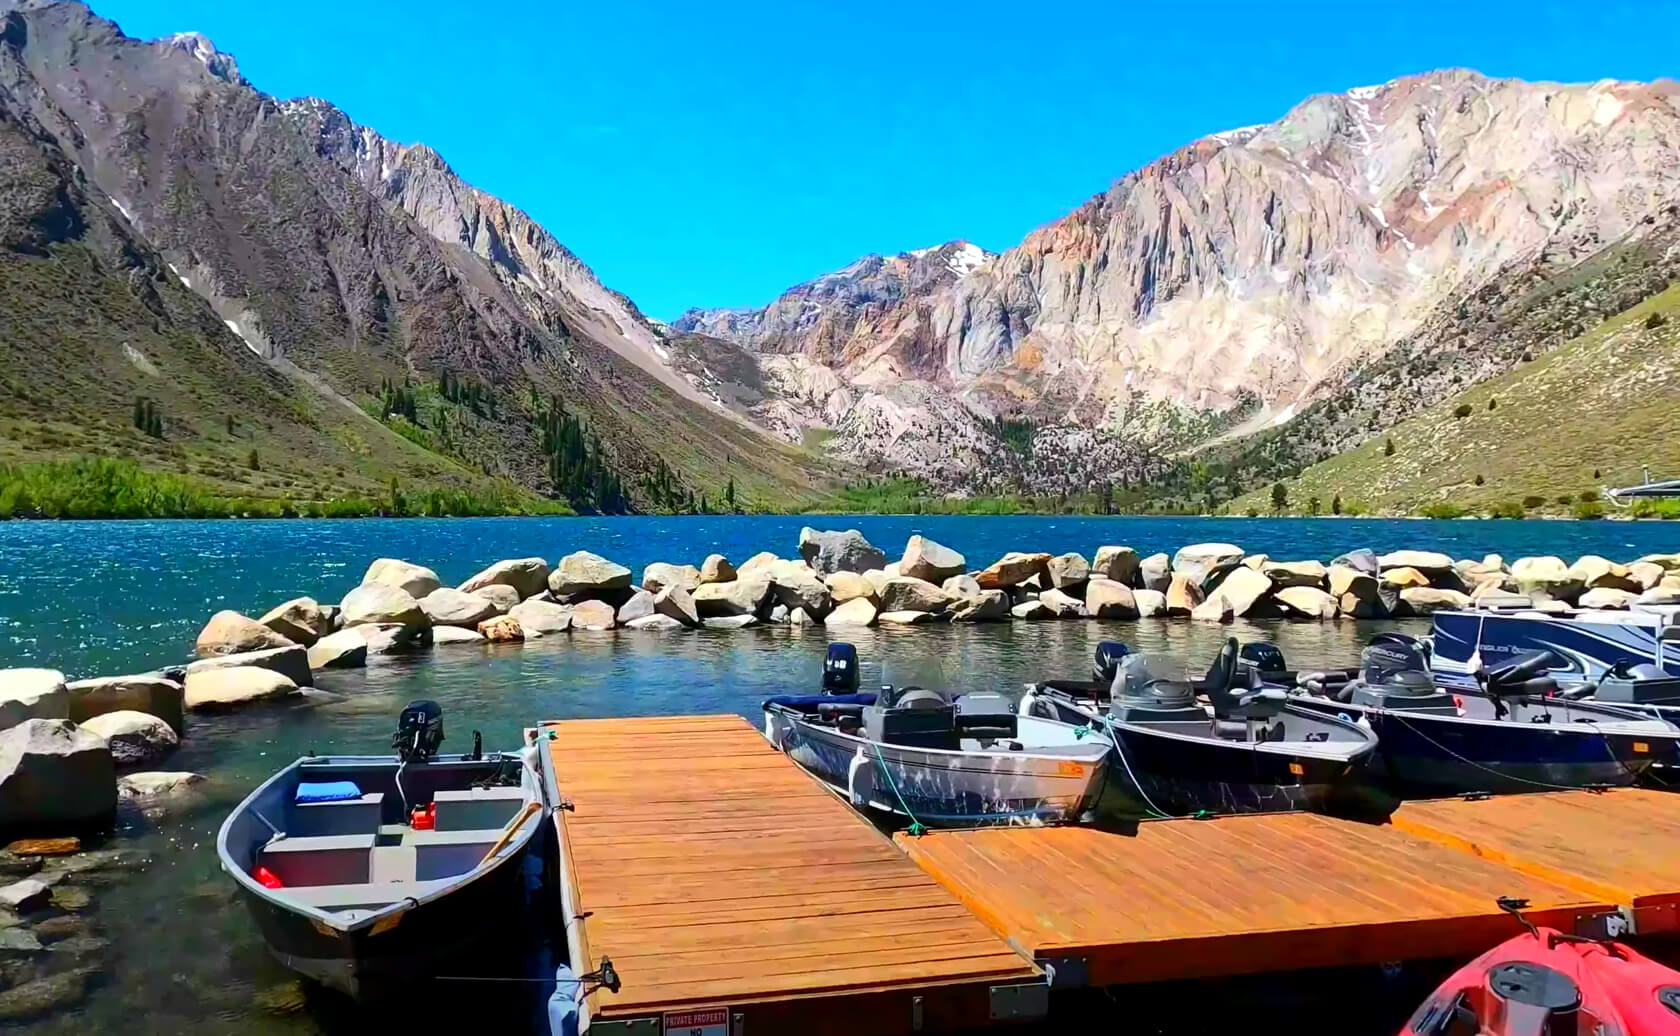 Convict-Lake-Reservoir-Fishing-Guide-Report-California-04